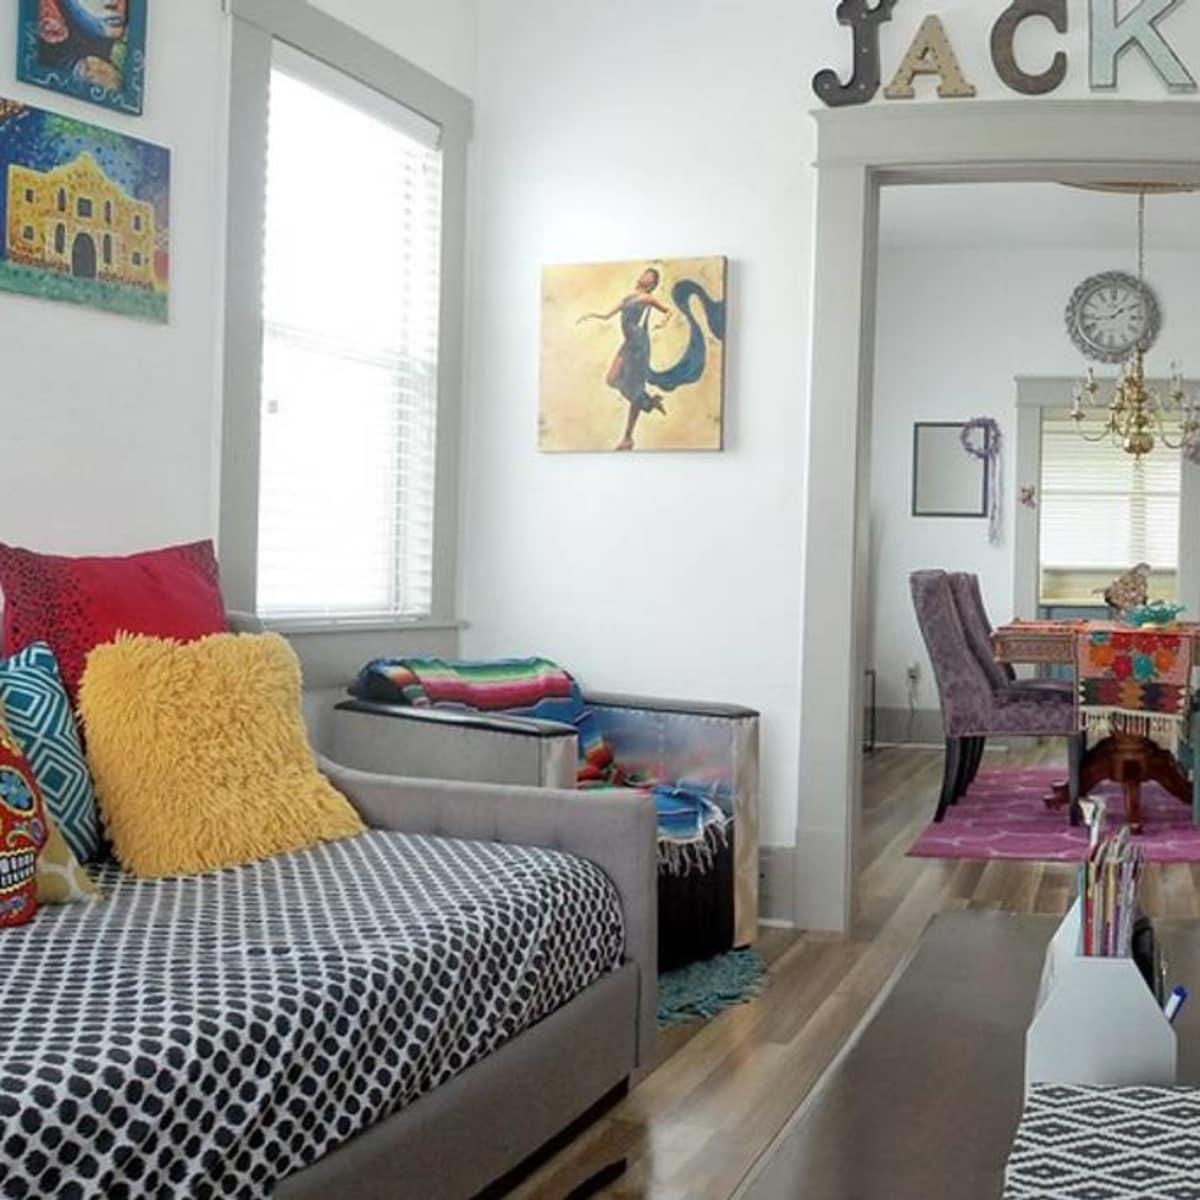 San Antonio Wish-listed Airbnb